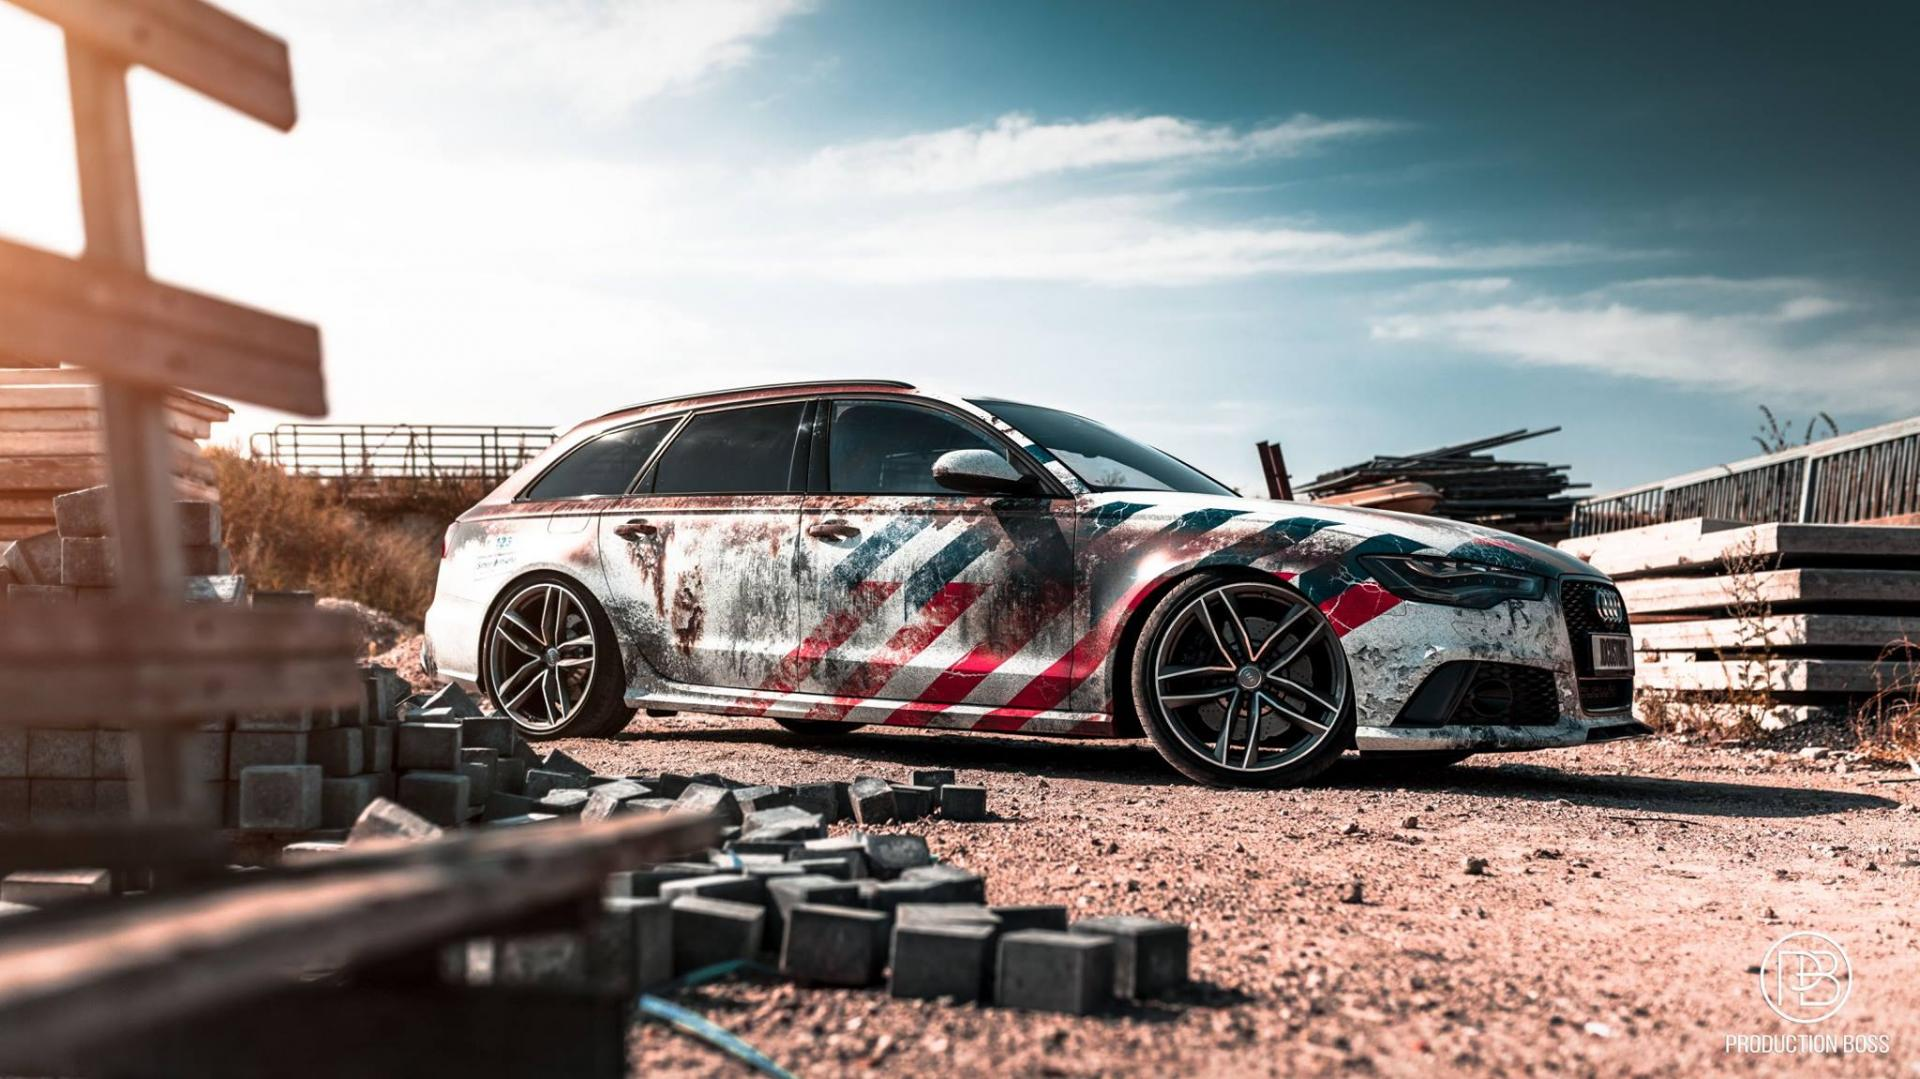 Audi RS 6 Team Interception gumball 3000